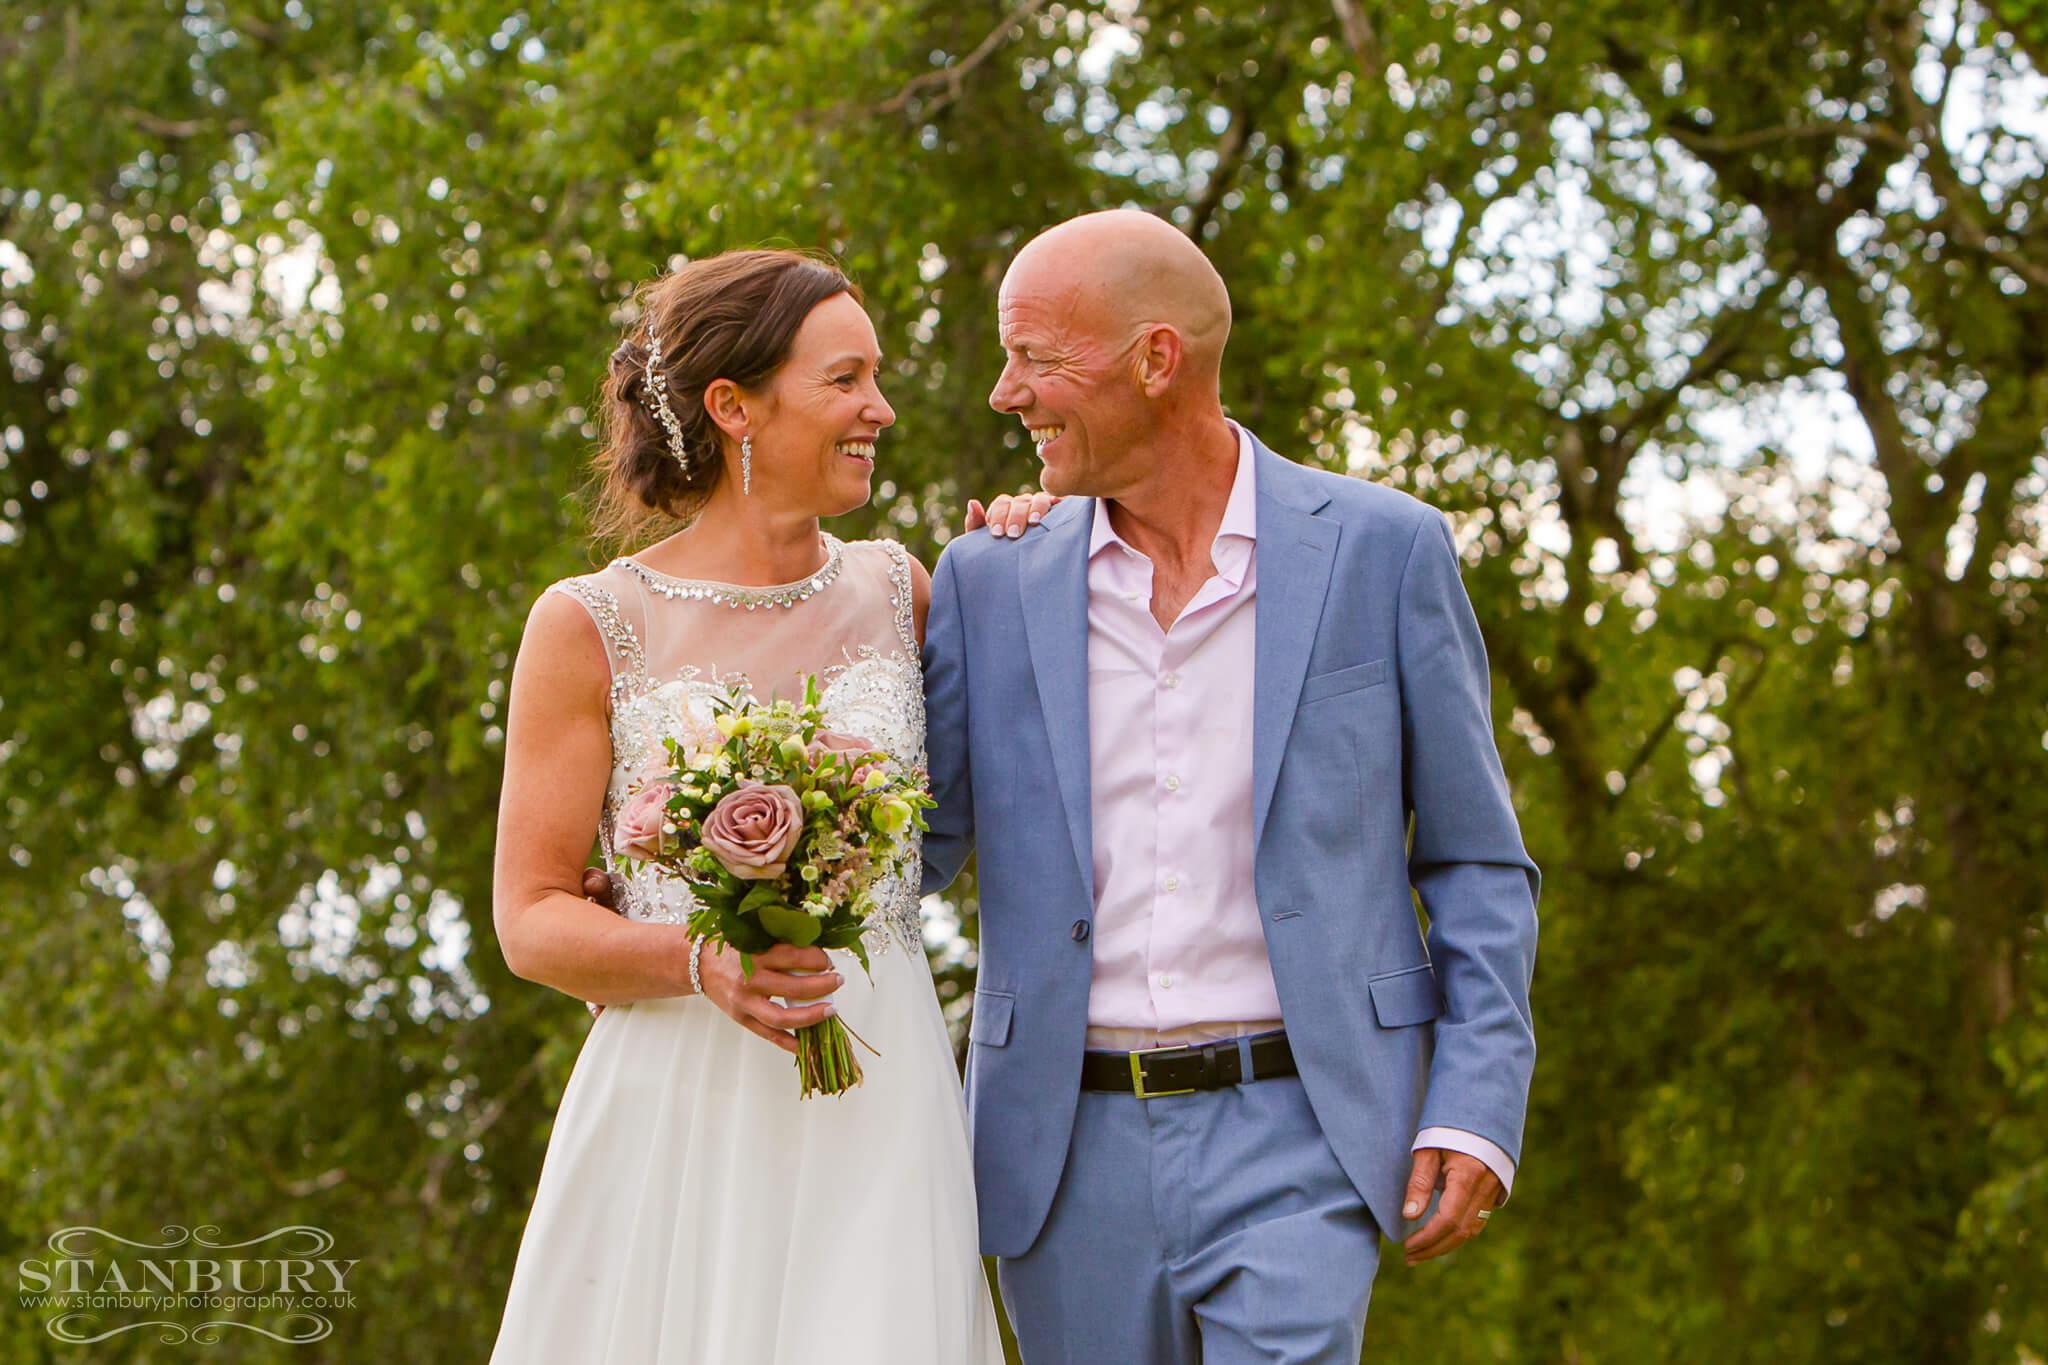 tipi-festival-bride-groom-wedding-photography-lancashire-stanbury-004